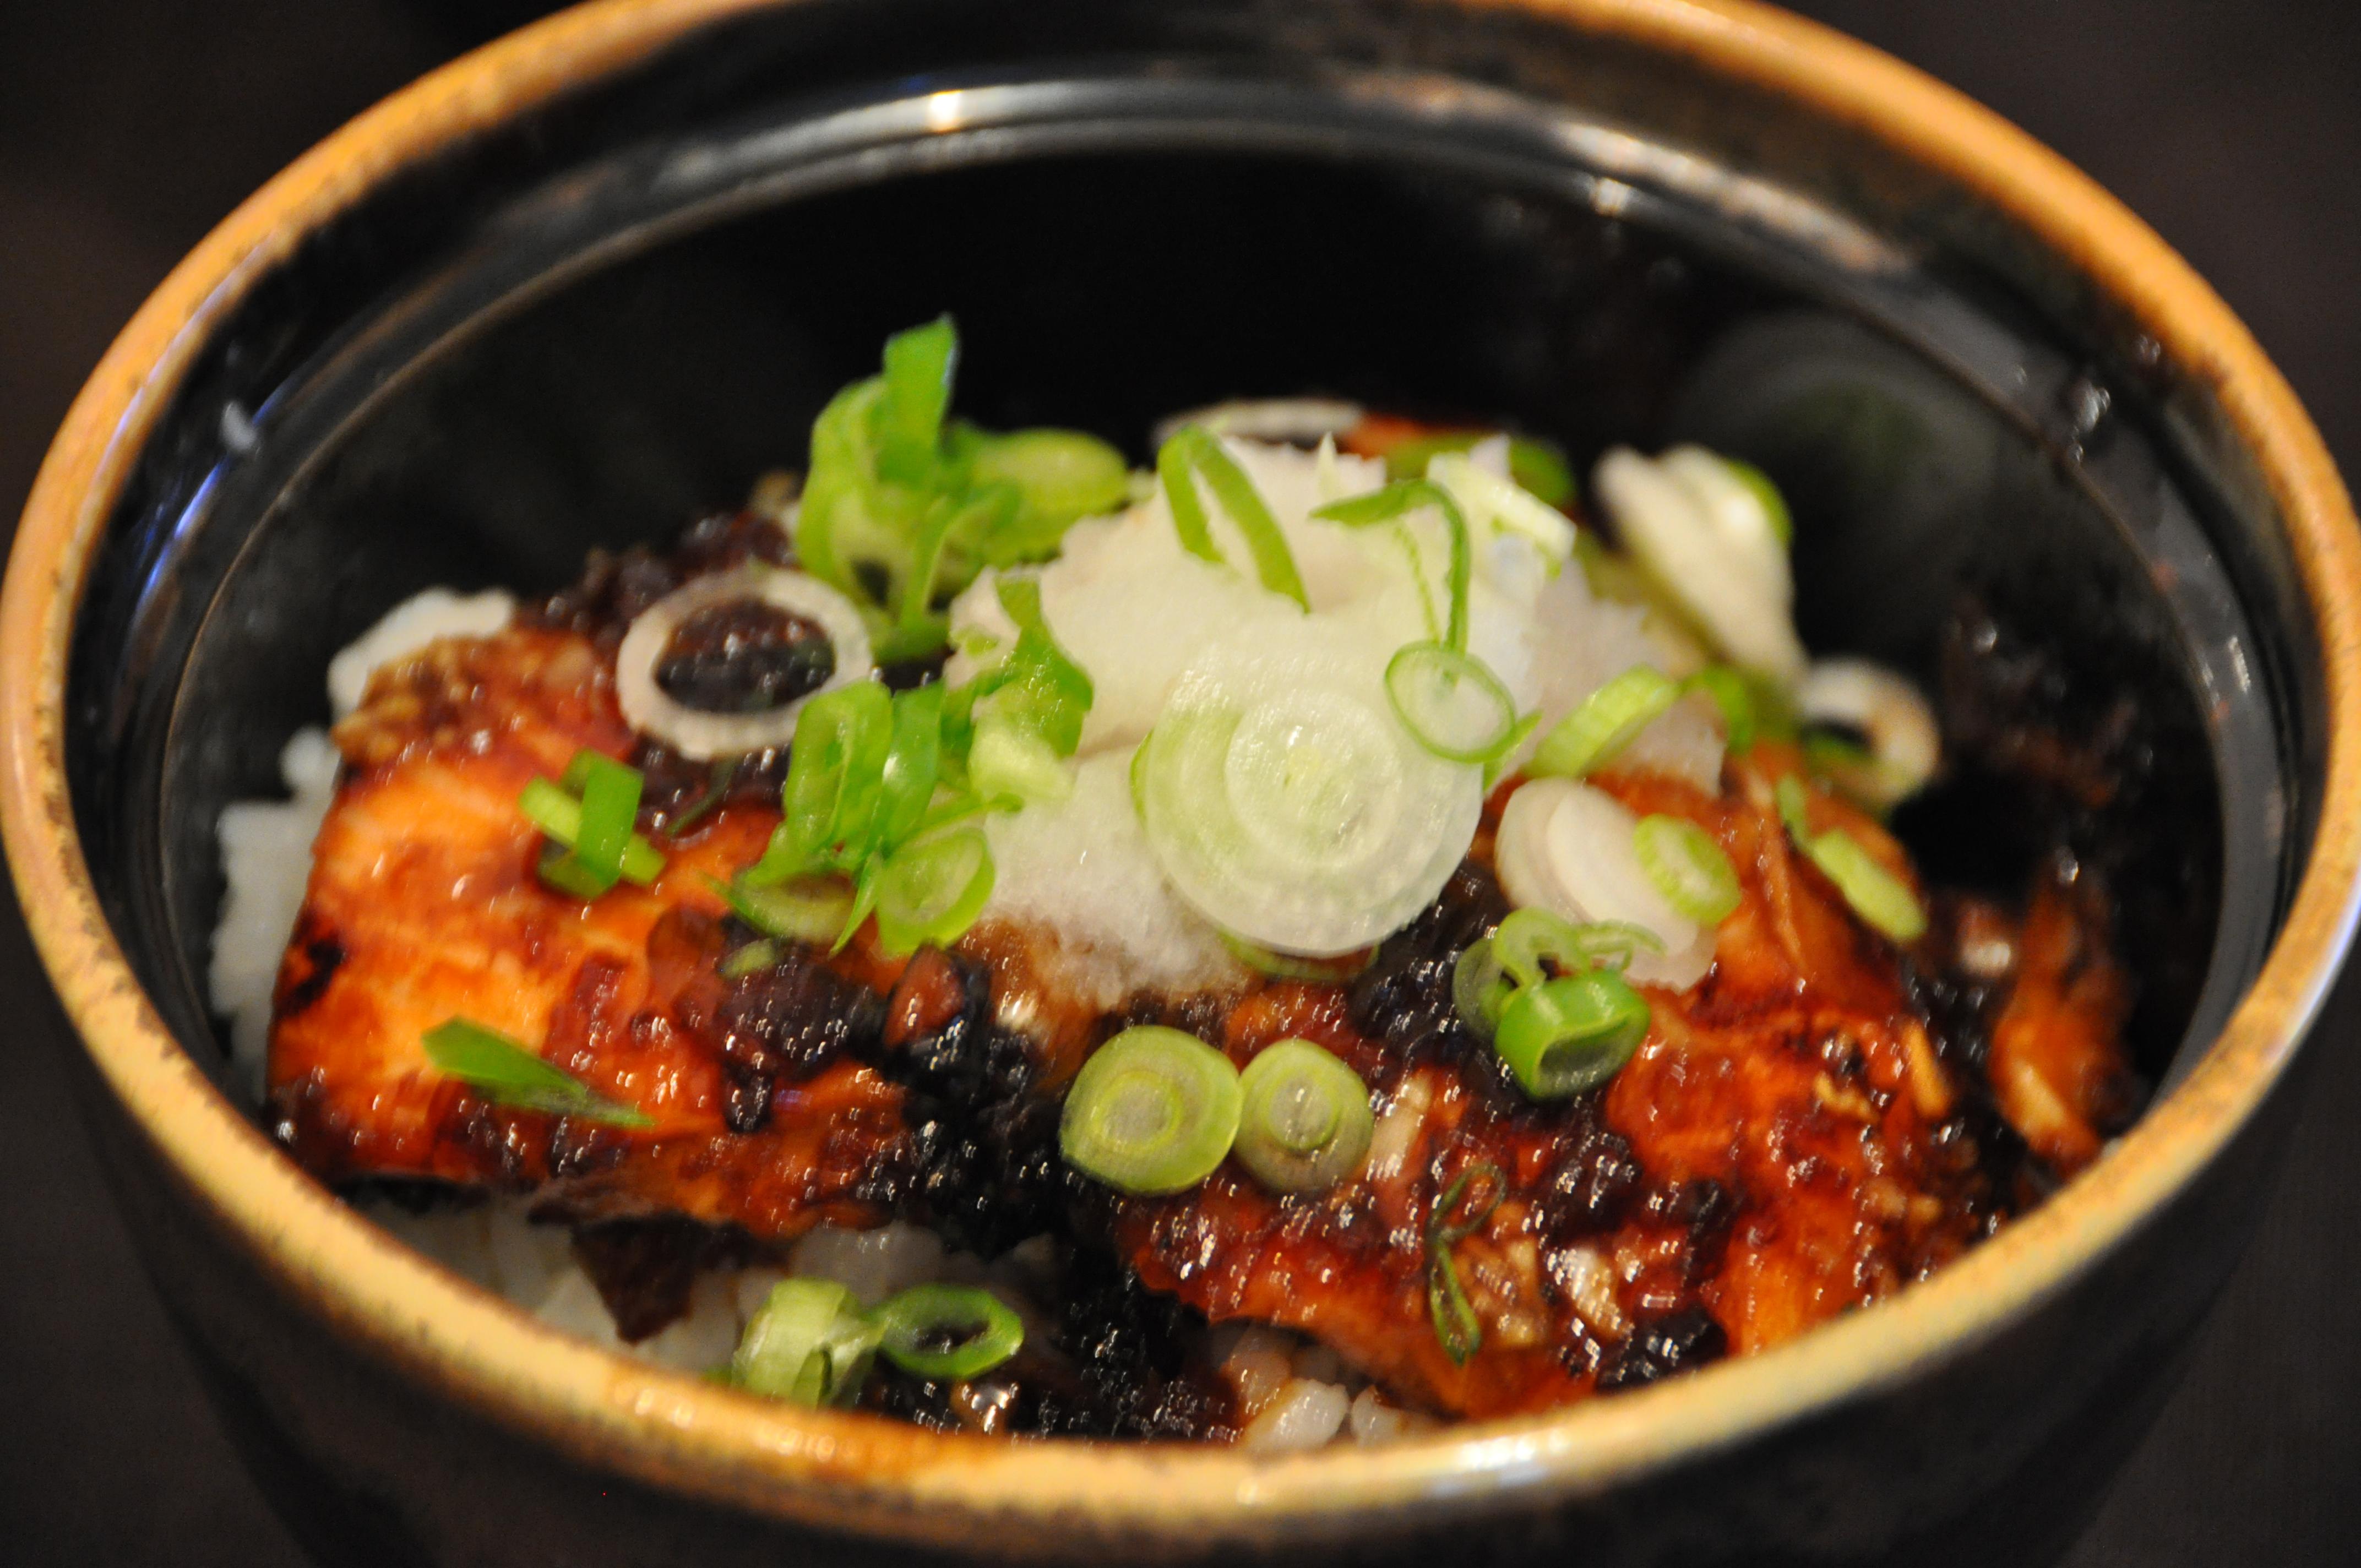 Teriyaki Salmon Donburi Japangourmet S Blog